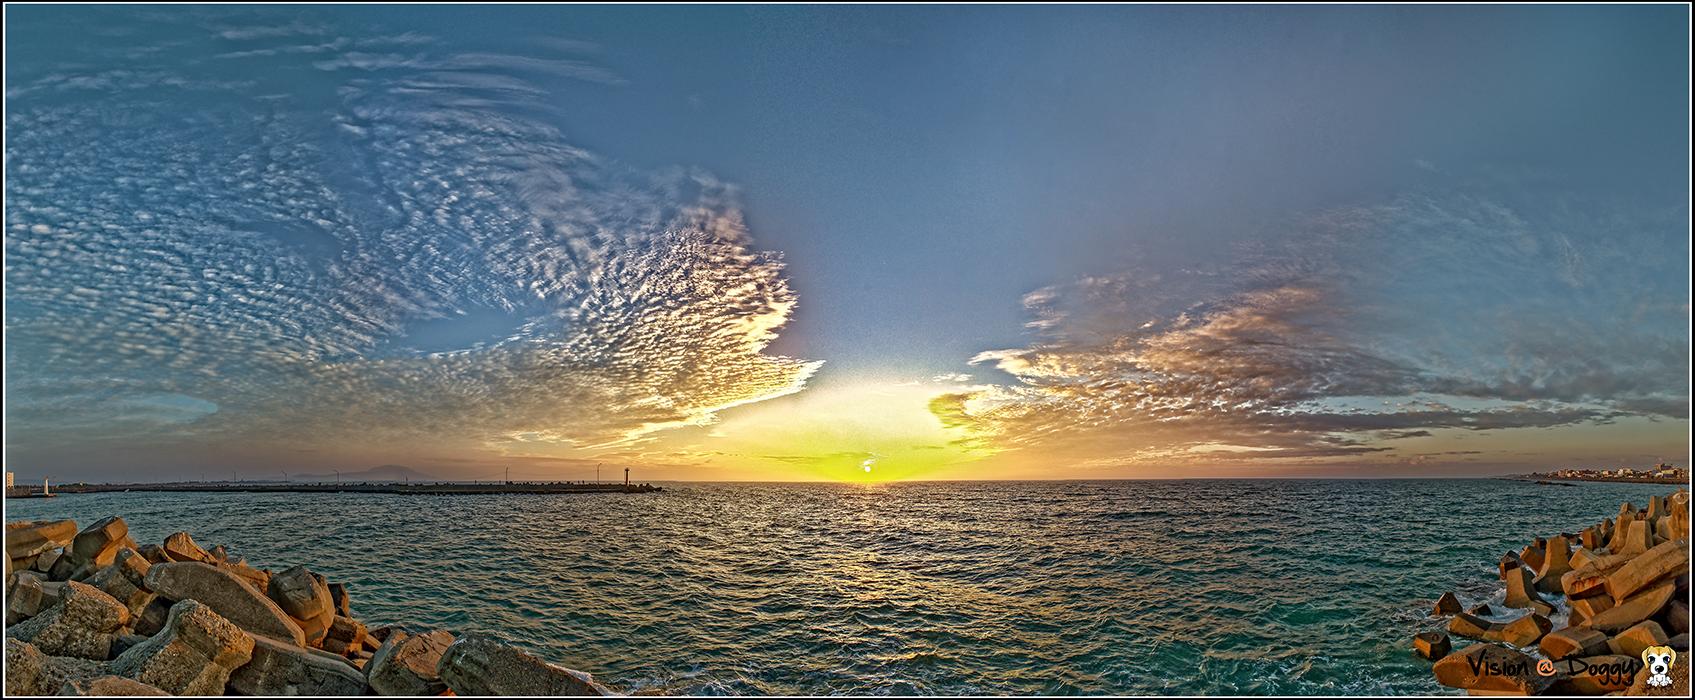 http://blog.hunternet.com.tw/wp-content/uploads/2018/12/pic-20181222-01-sunset.png